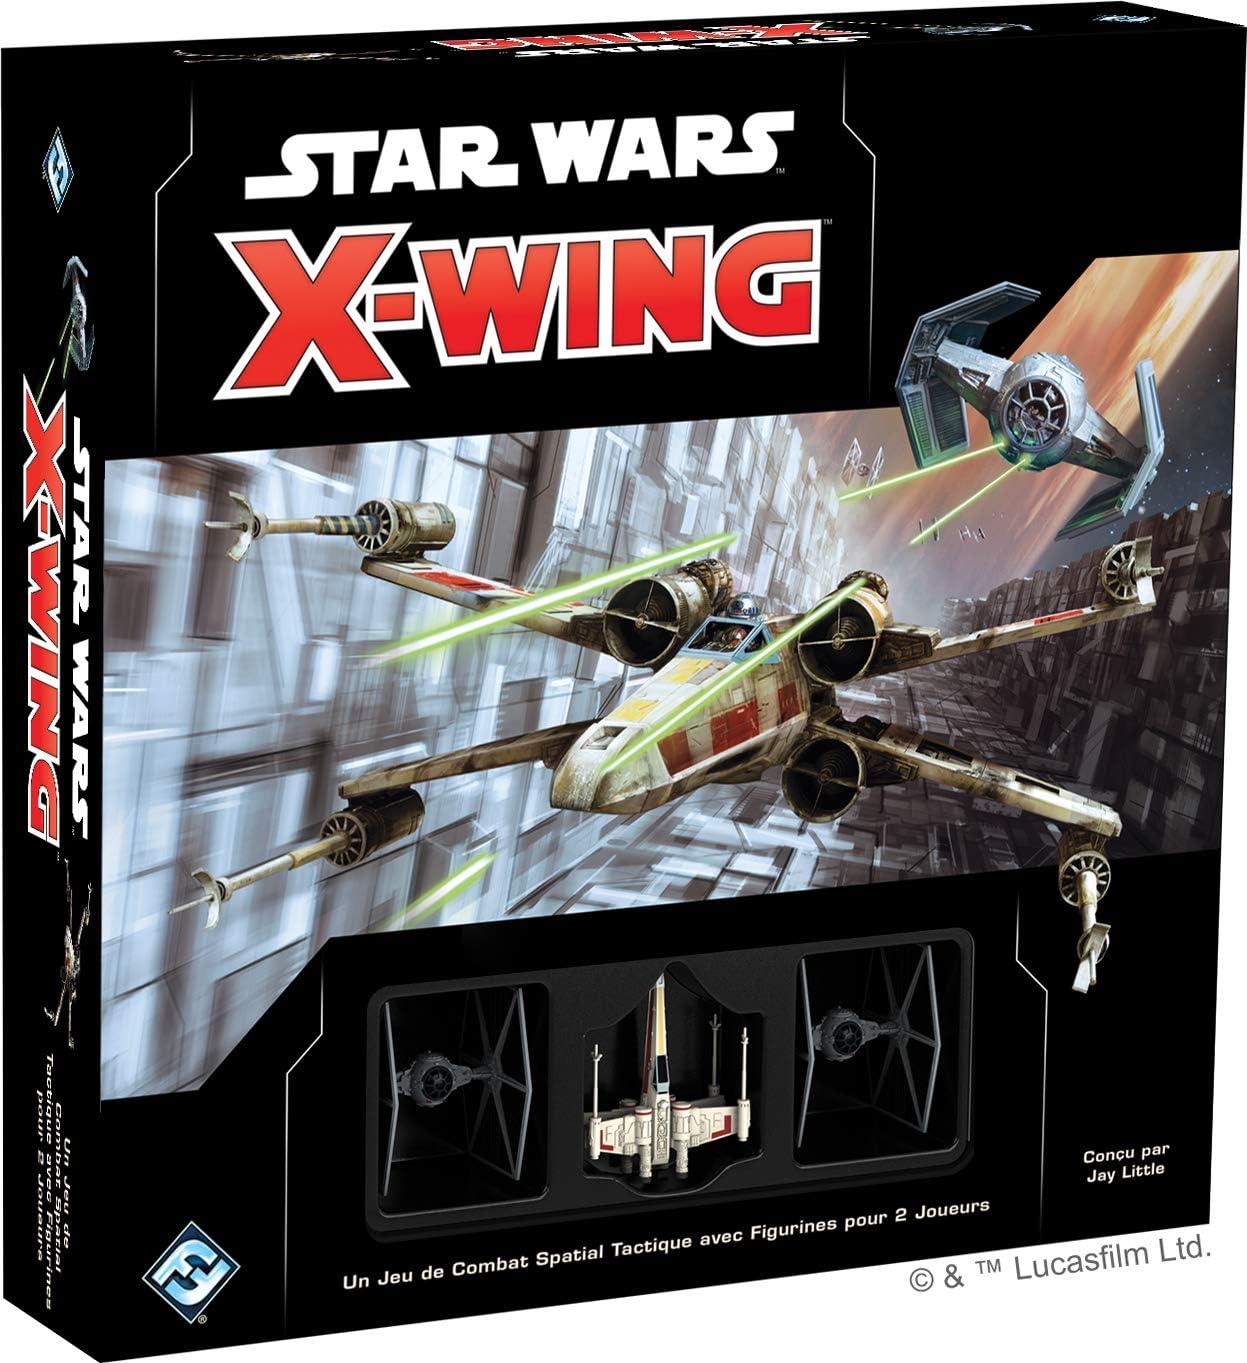 FFGSWZ01 Jeu De Figurines Asmodee Star Wars X-Wing 2.0